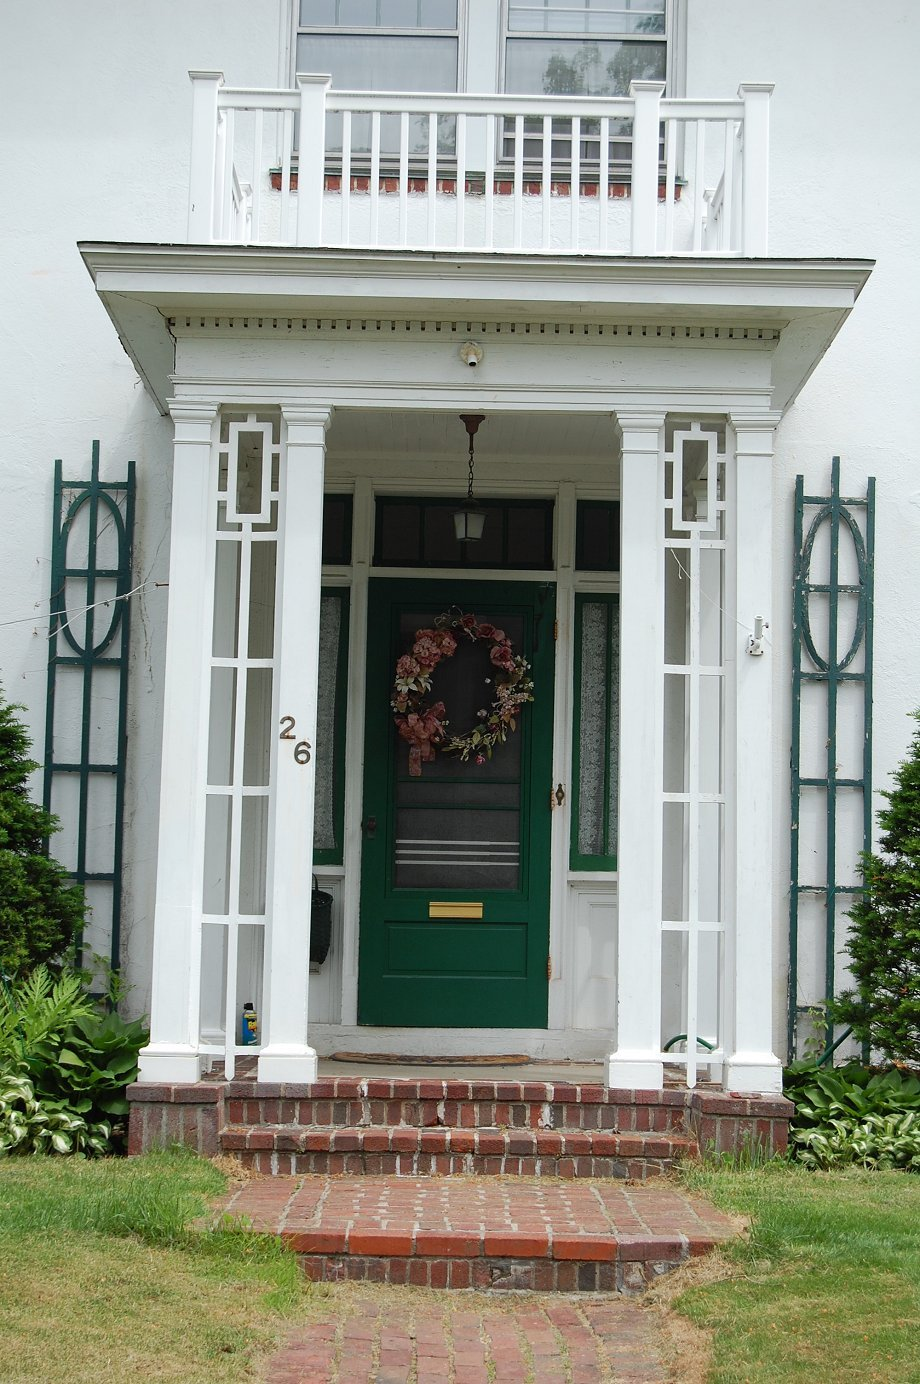 38 pretty front doors upload a photo of your front door - Front doors on white houses ...